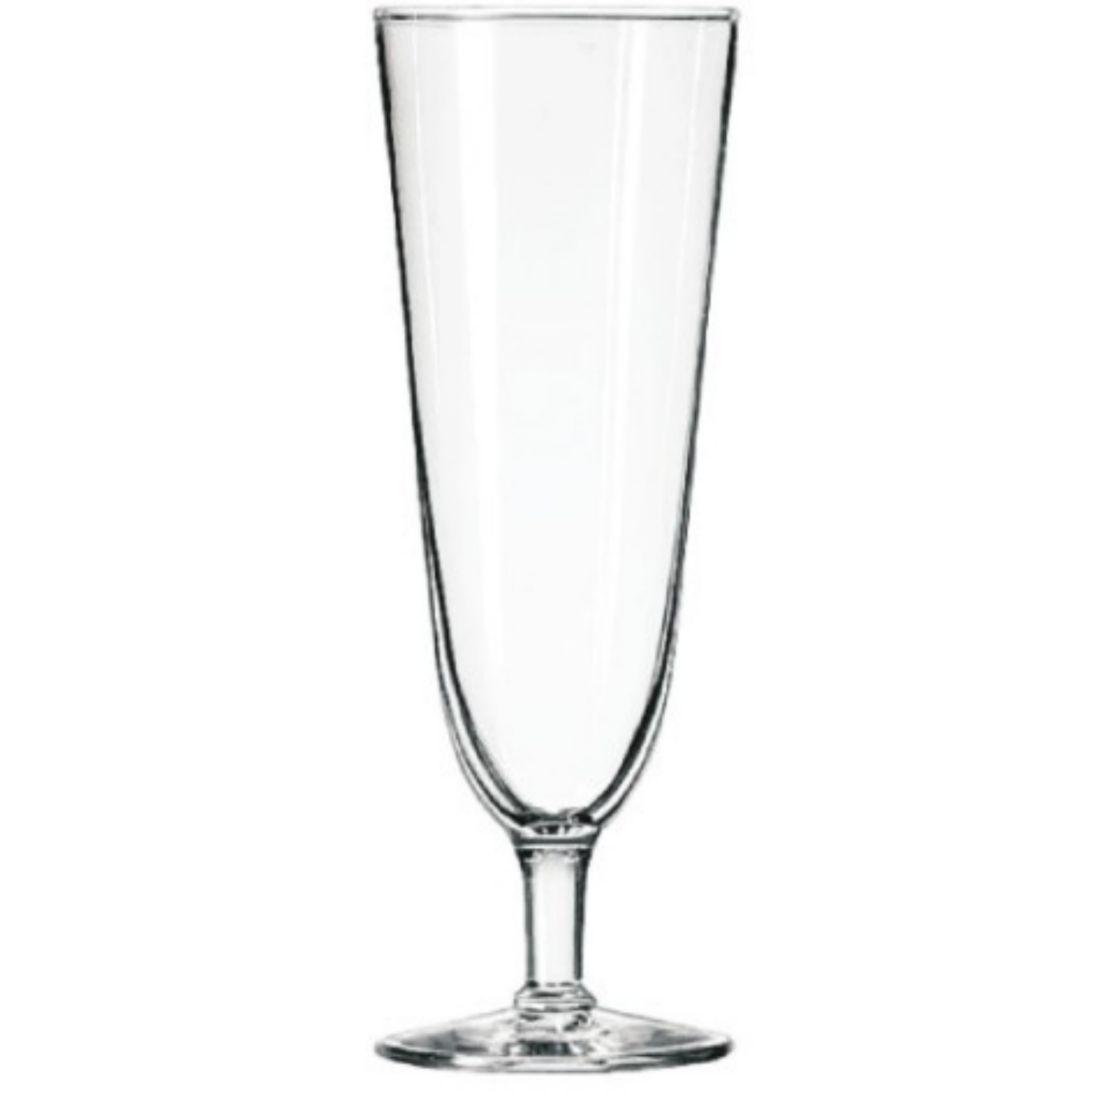 Citation sklenička na pivo 35 cl